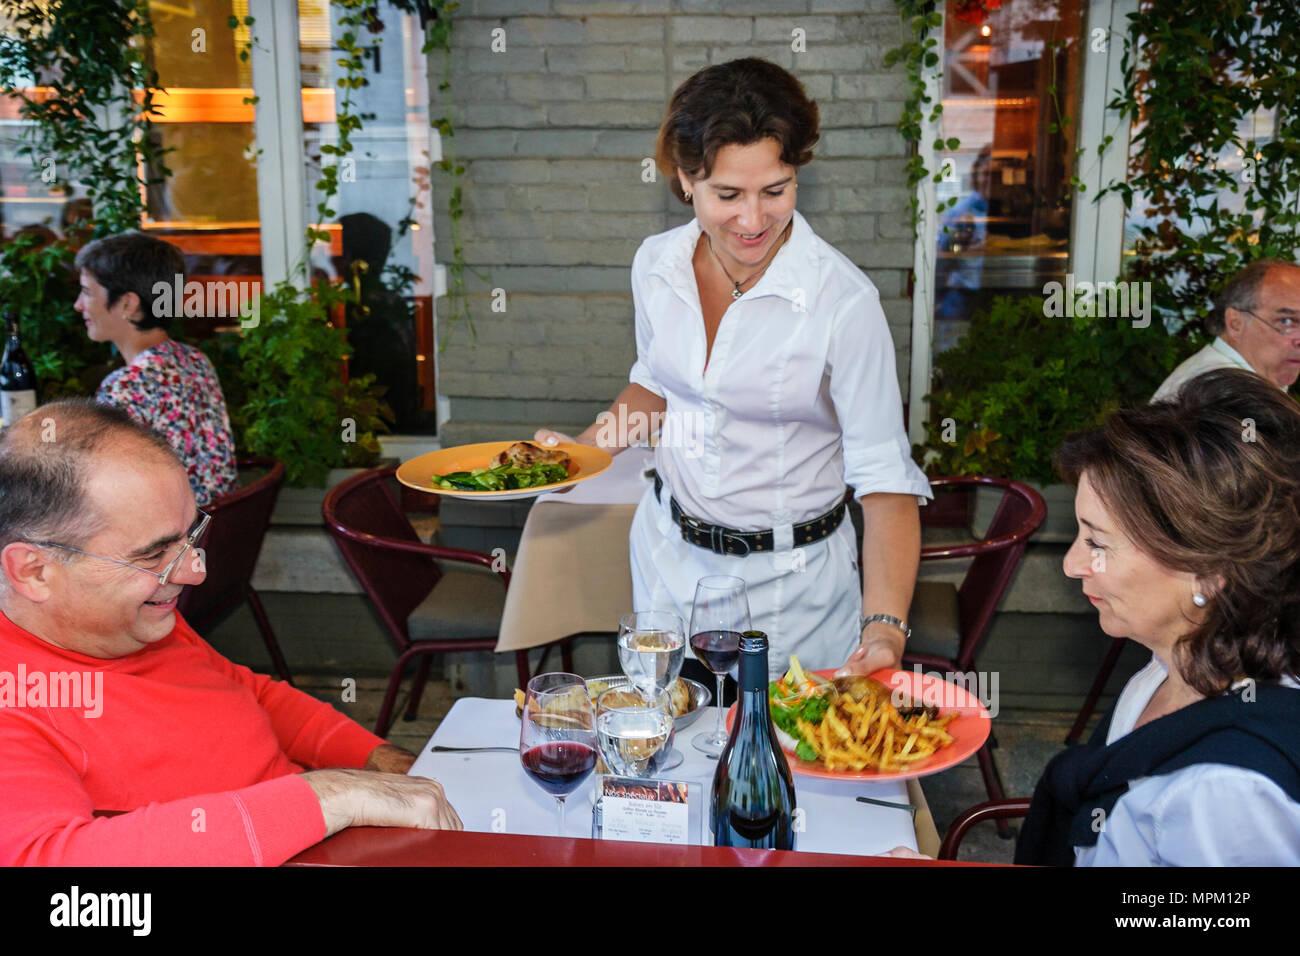 Città di Québec in Canada la Città Bassa Rue du Sault au Matelot L'Echaude ristorante cene alfresco cameriera serve cibo Immagini Stock